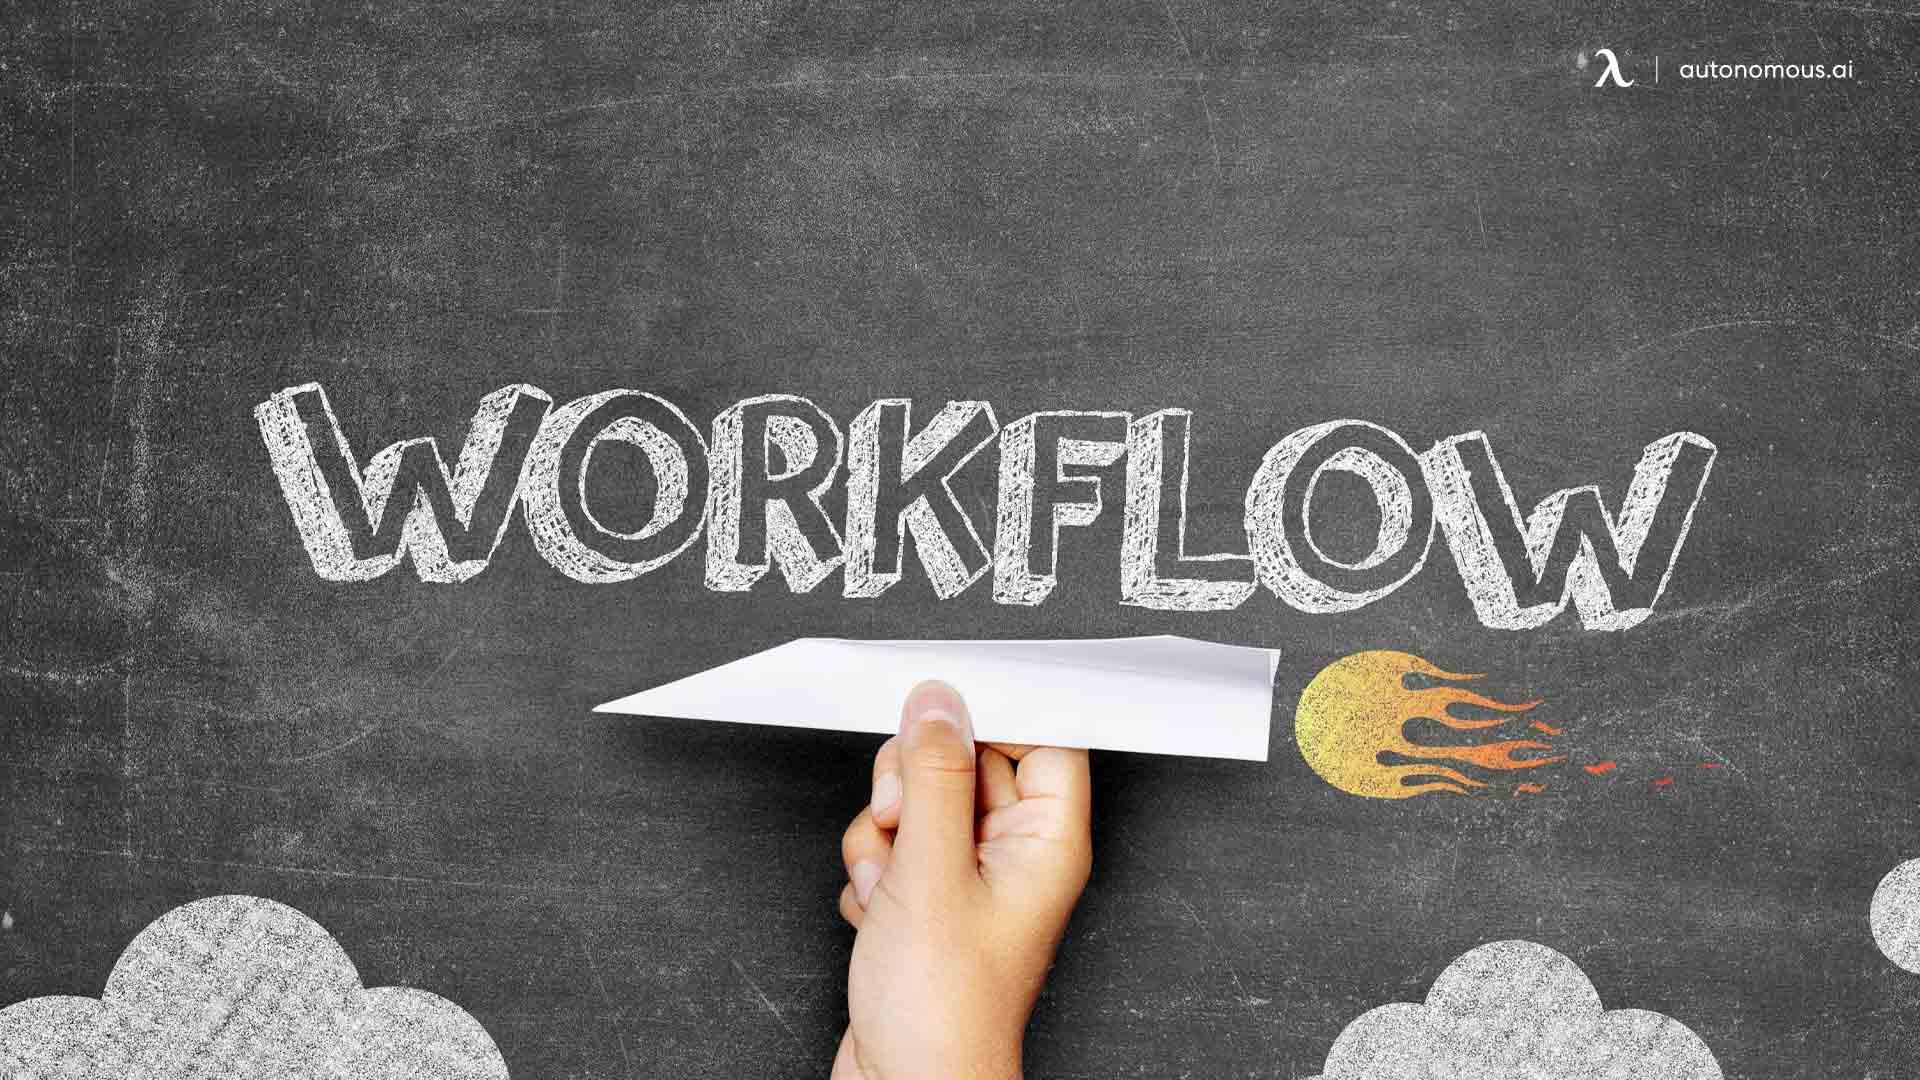 Improving the workflow may increase employee satisfaction